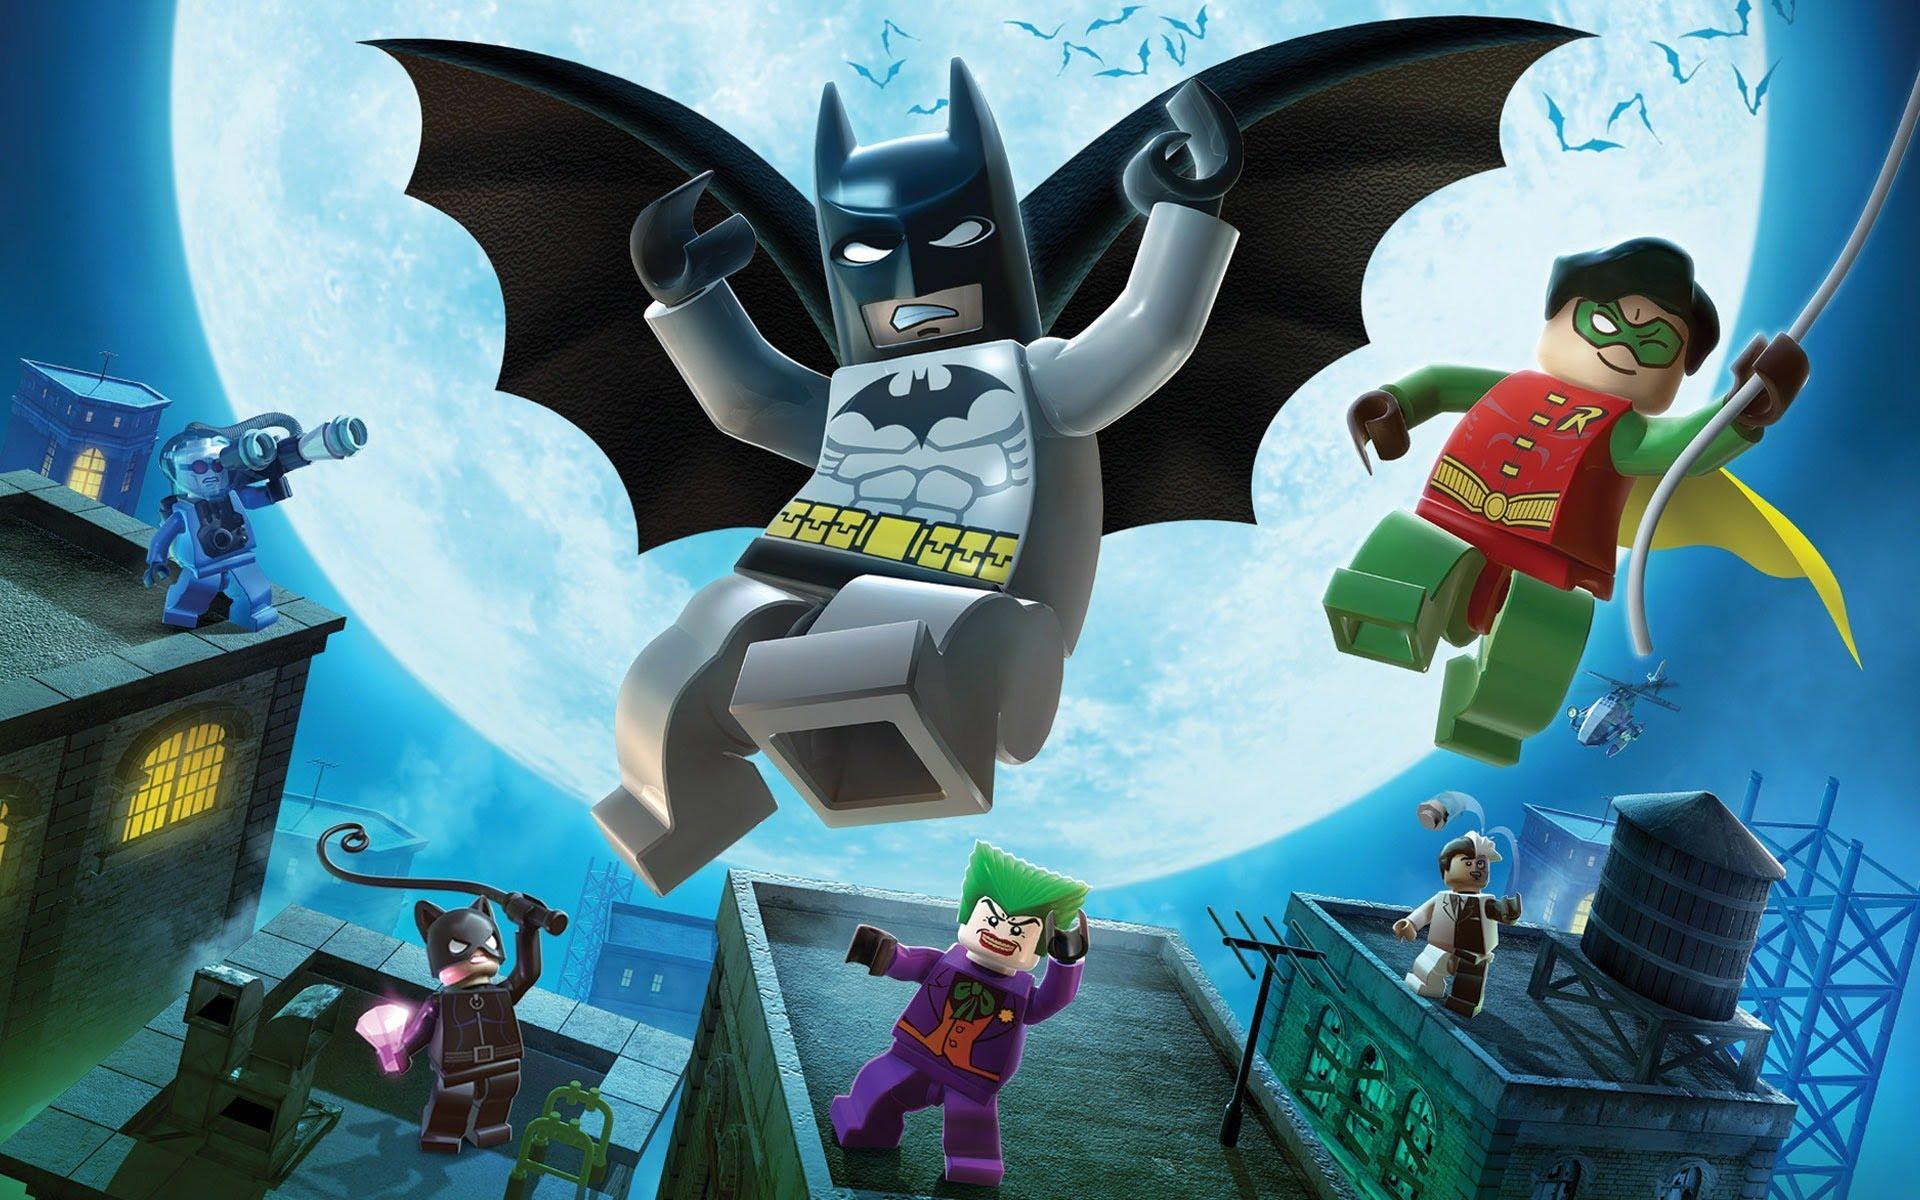 Lego Batman To Get Solo Film - Bleeding Cool Comic Book, Movie, TV News